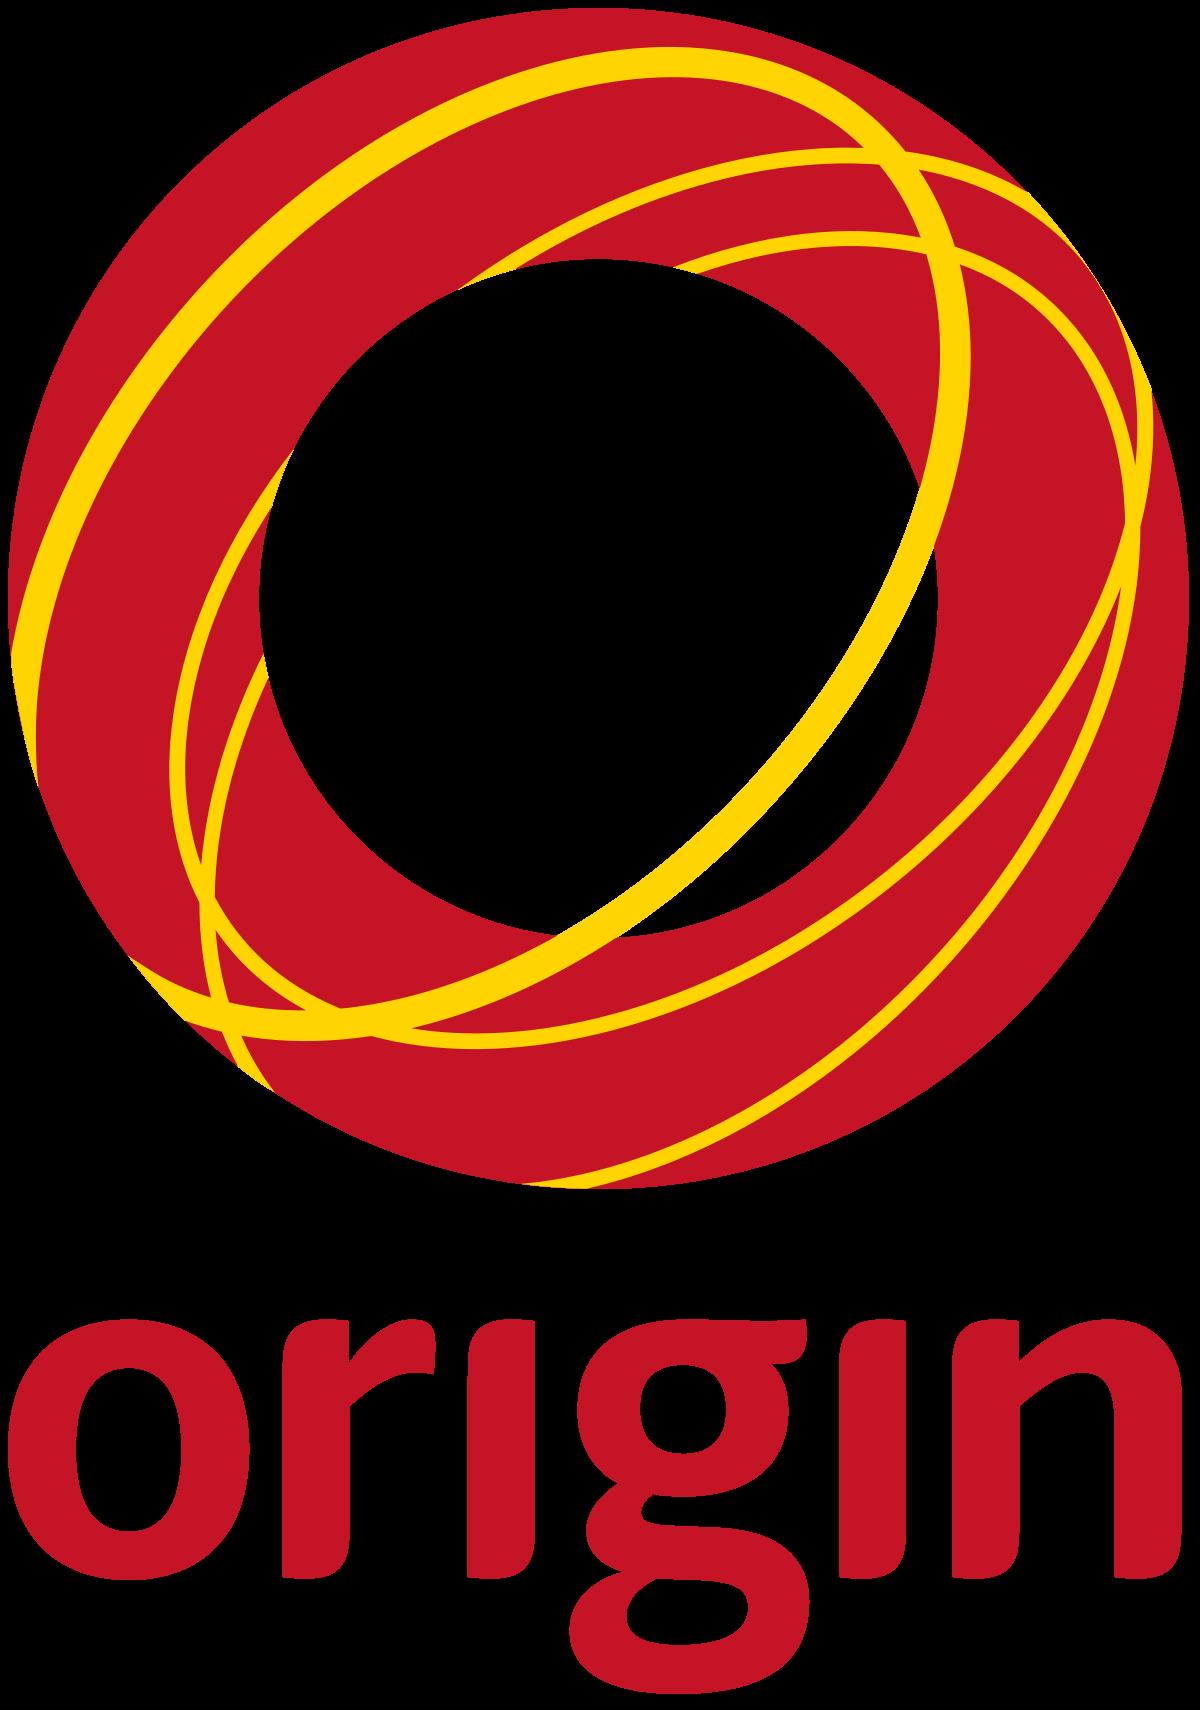 Energy clipart energy transformation. Origin wikipedia